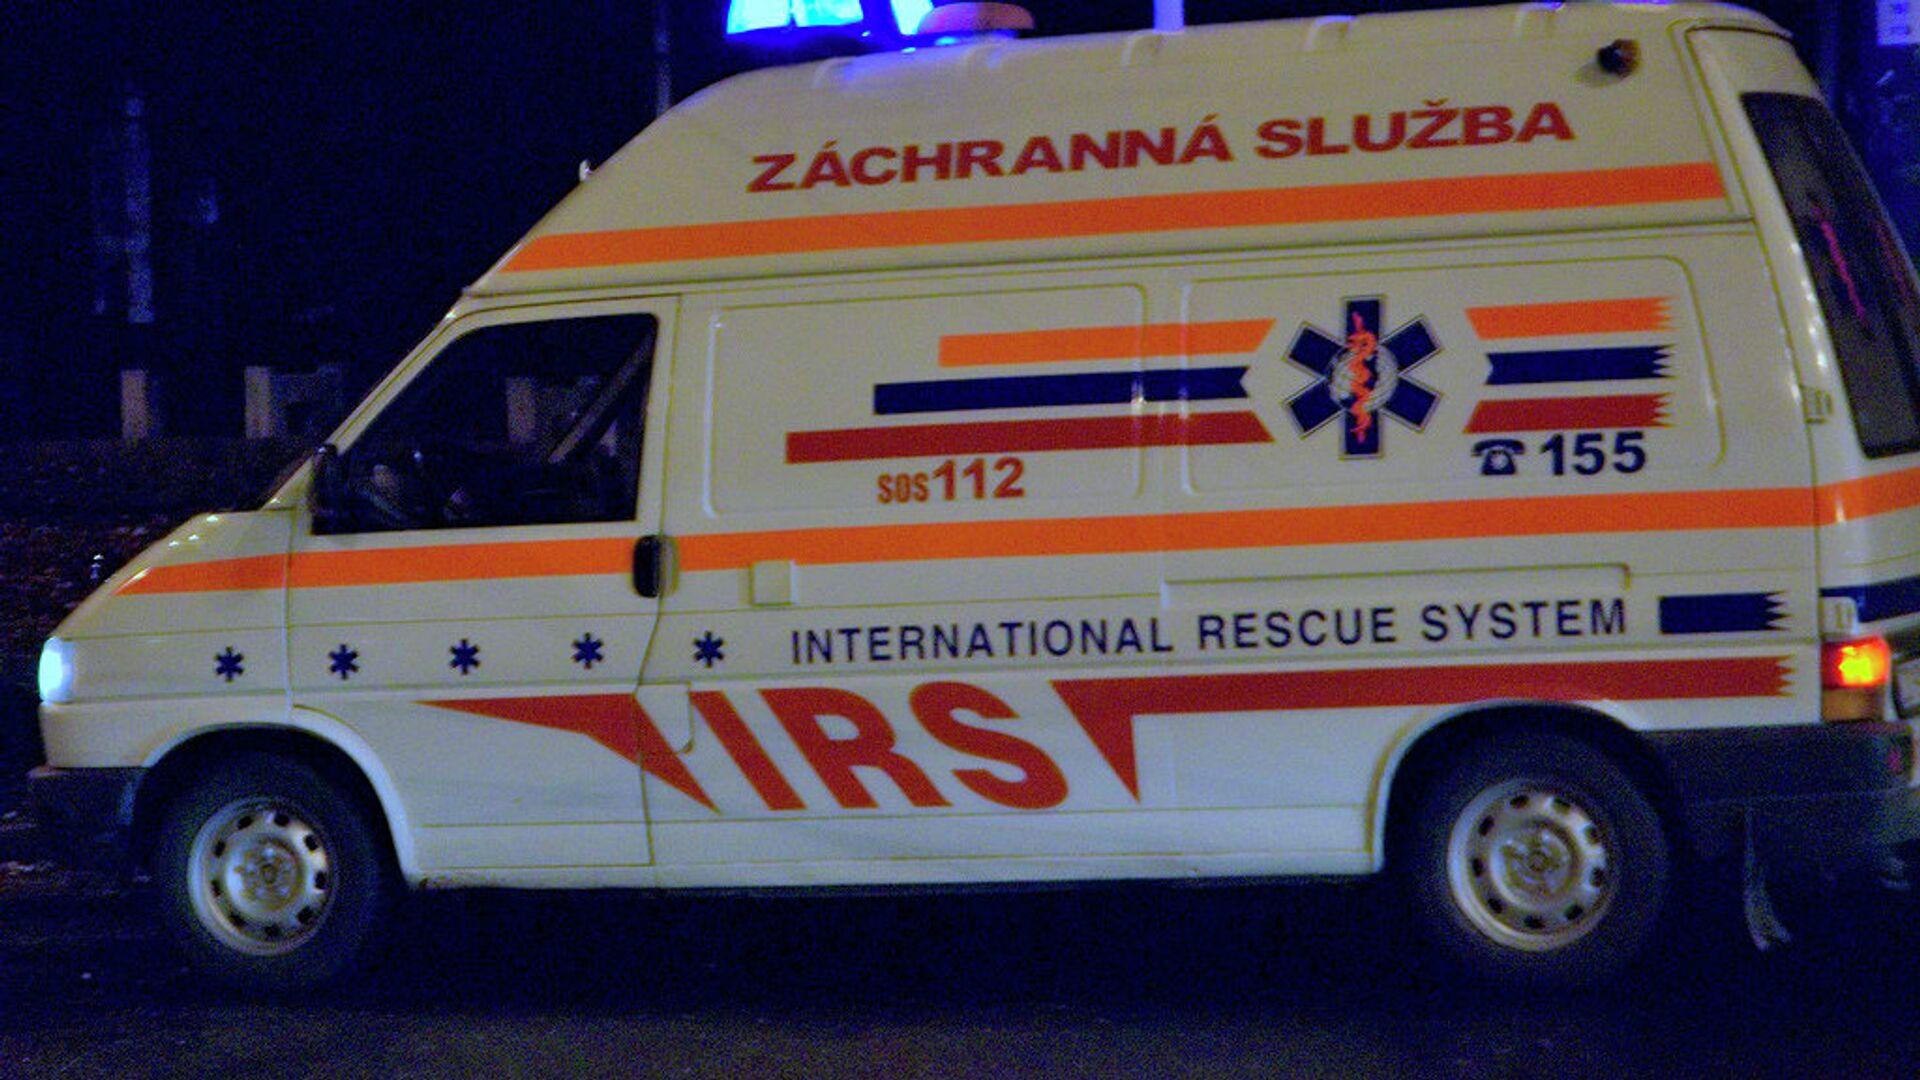 Карета скорой помощи в Словакии - РИА Новости, 1920, 10.05.2021